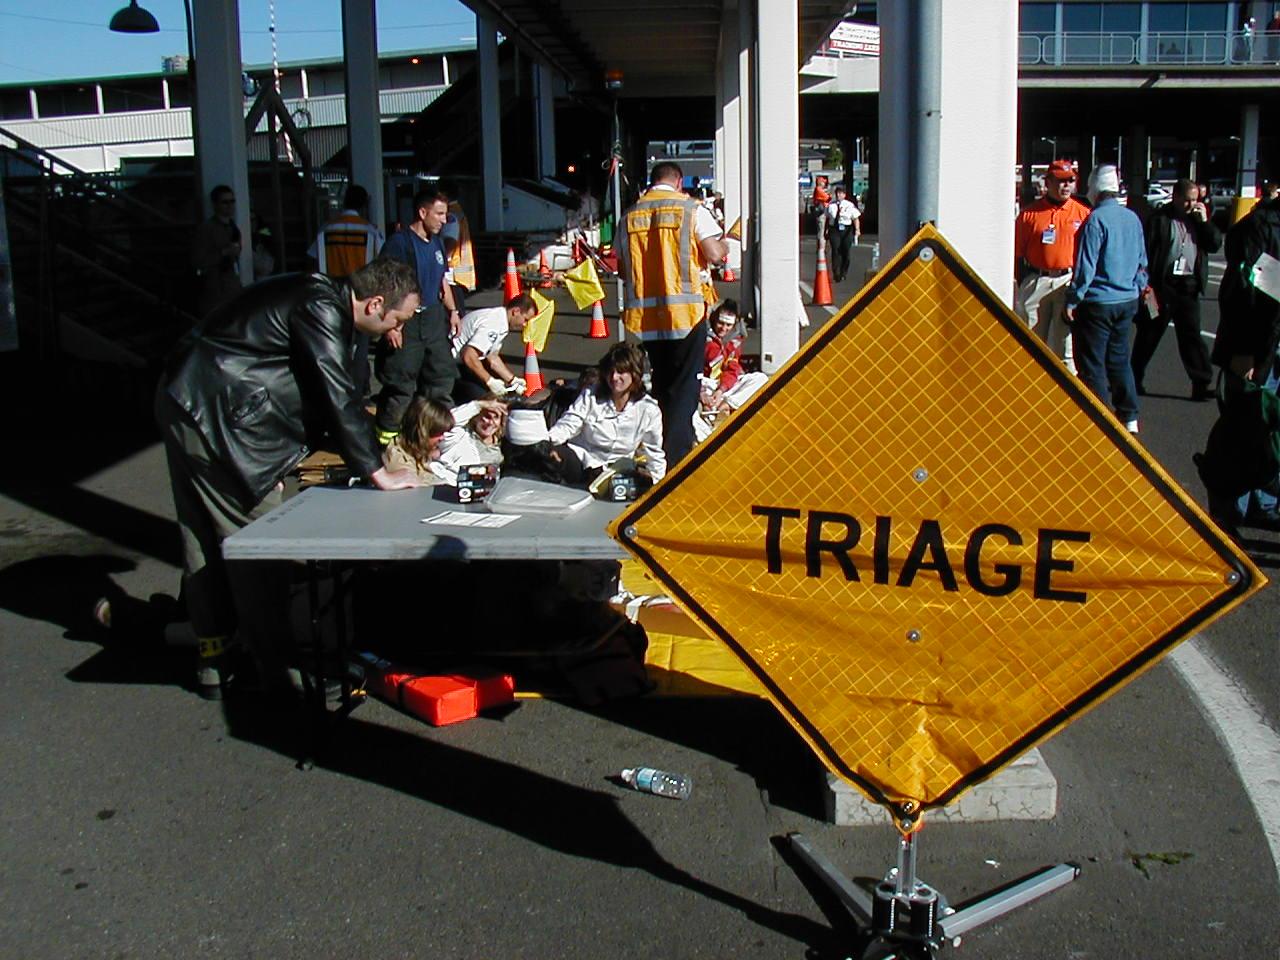 Triage Station, Port of Seattle Ferry MTR training, Edmonds, WA